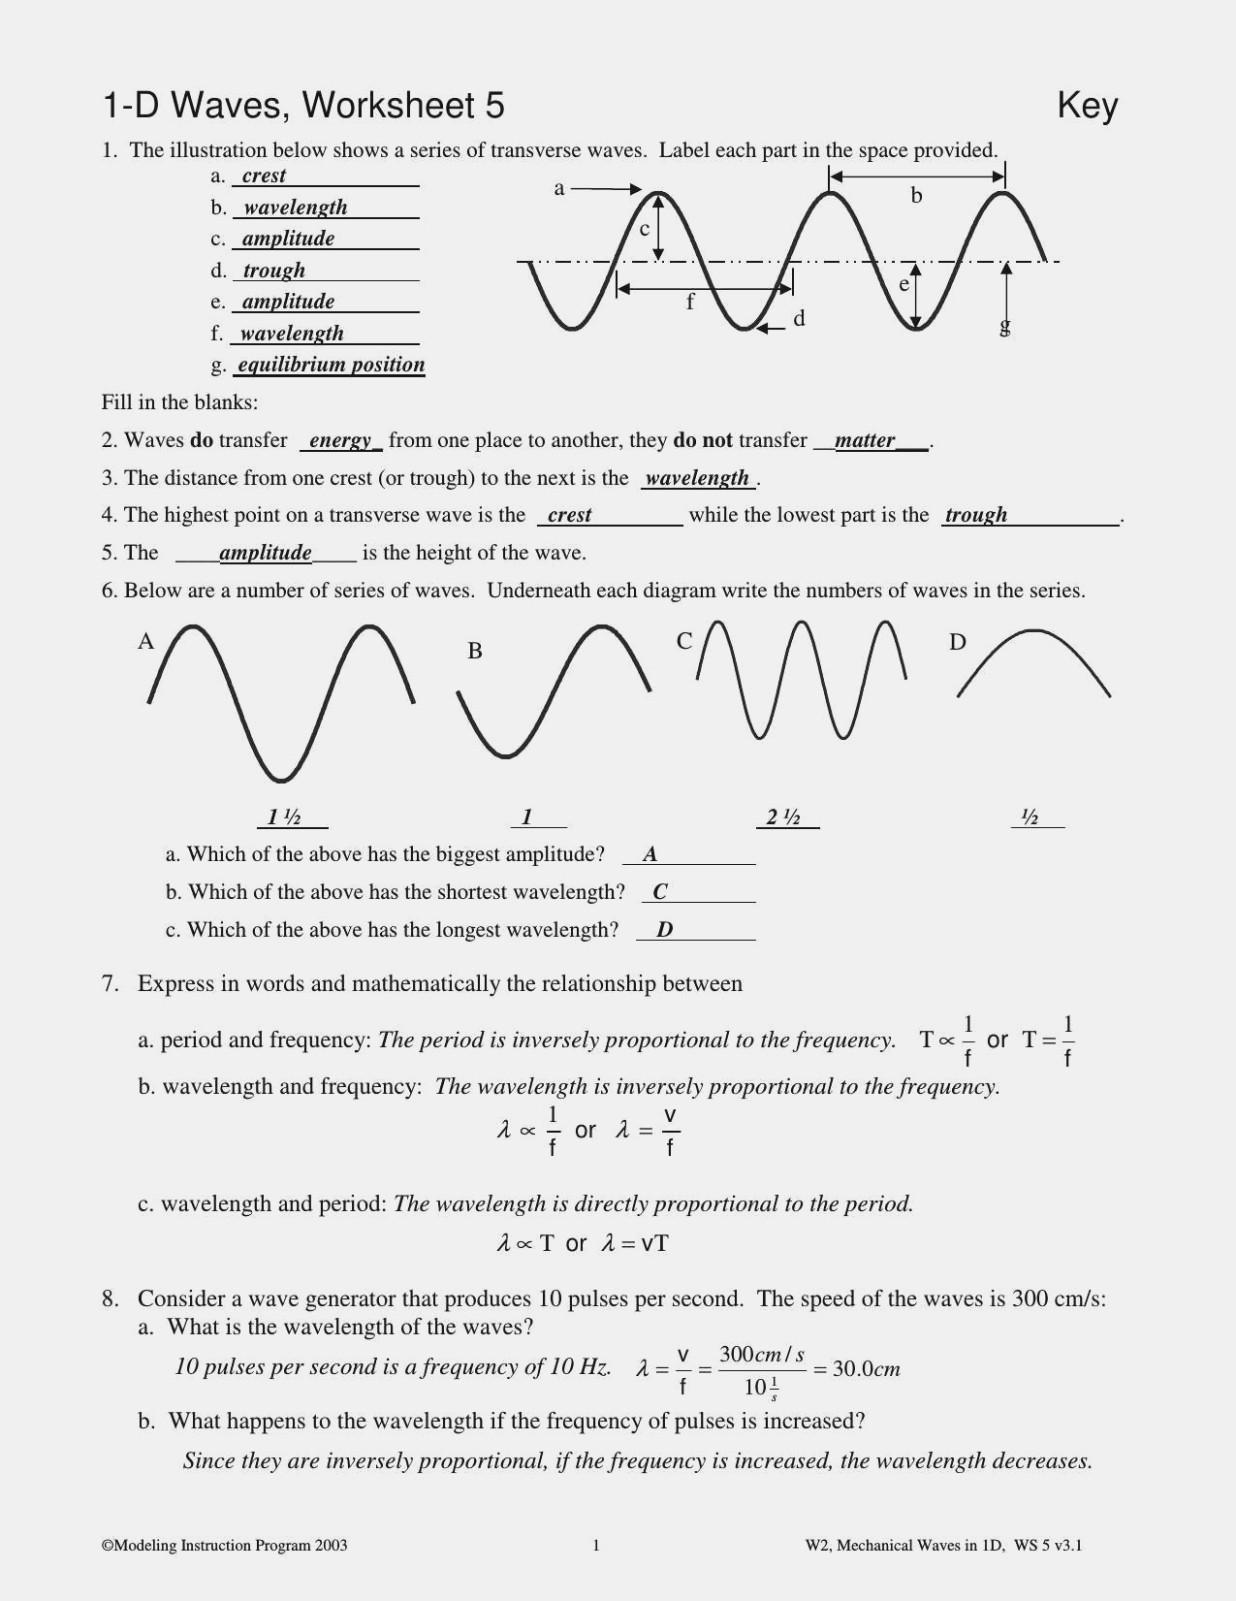 Electromagnetic Spectrum Worksheet Answers 33 Waves Worksheet Answer Key Free Worksheet Spreadsheet